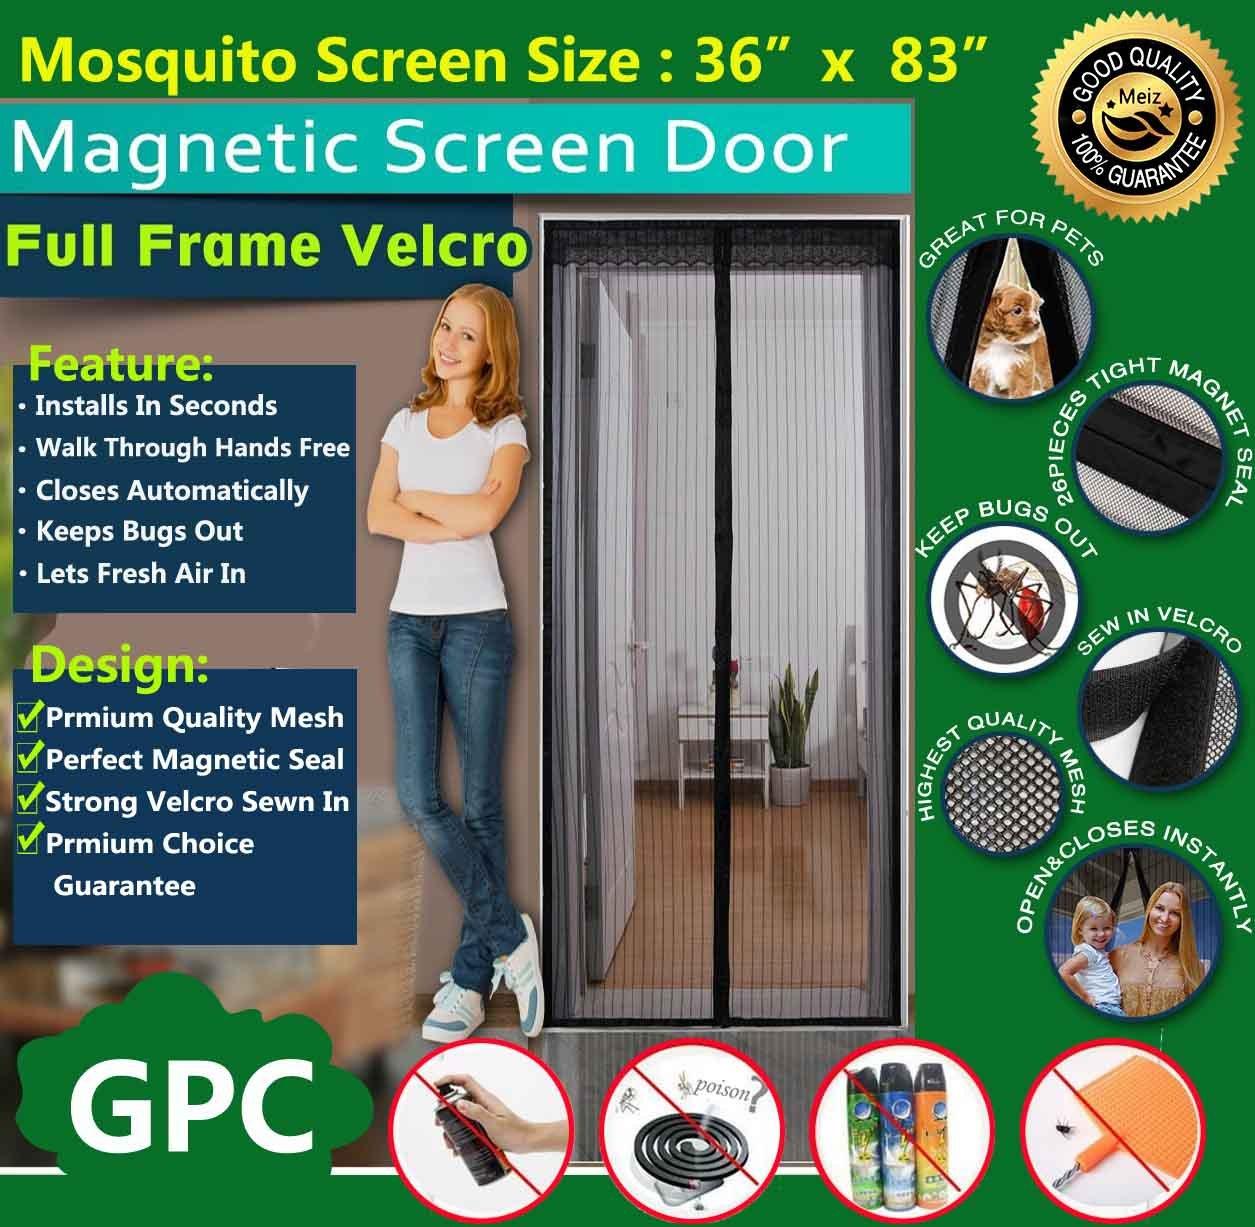 Meiz Magnetic Screen Door ,Instant Screen Door 36'' x 83'',Keeps Bugs Out,Lets Fresh Air In,Toddler And Pet Friendly, Fits Door Up To 34'' x 82'',Black